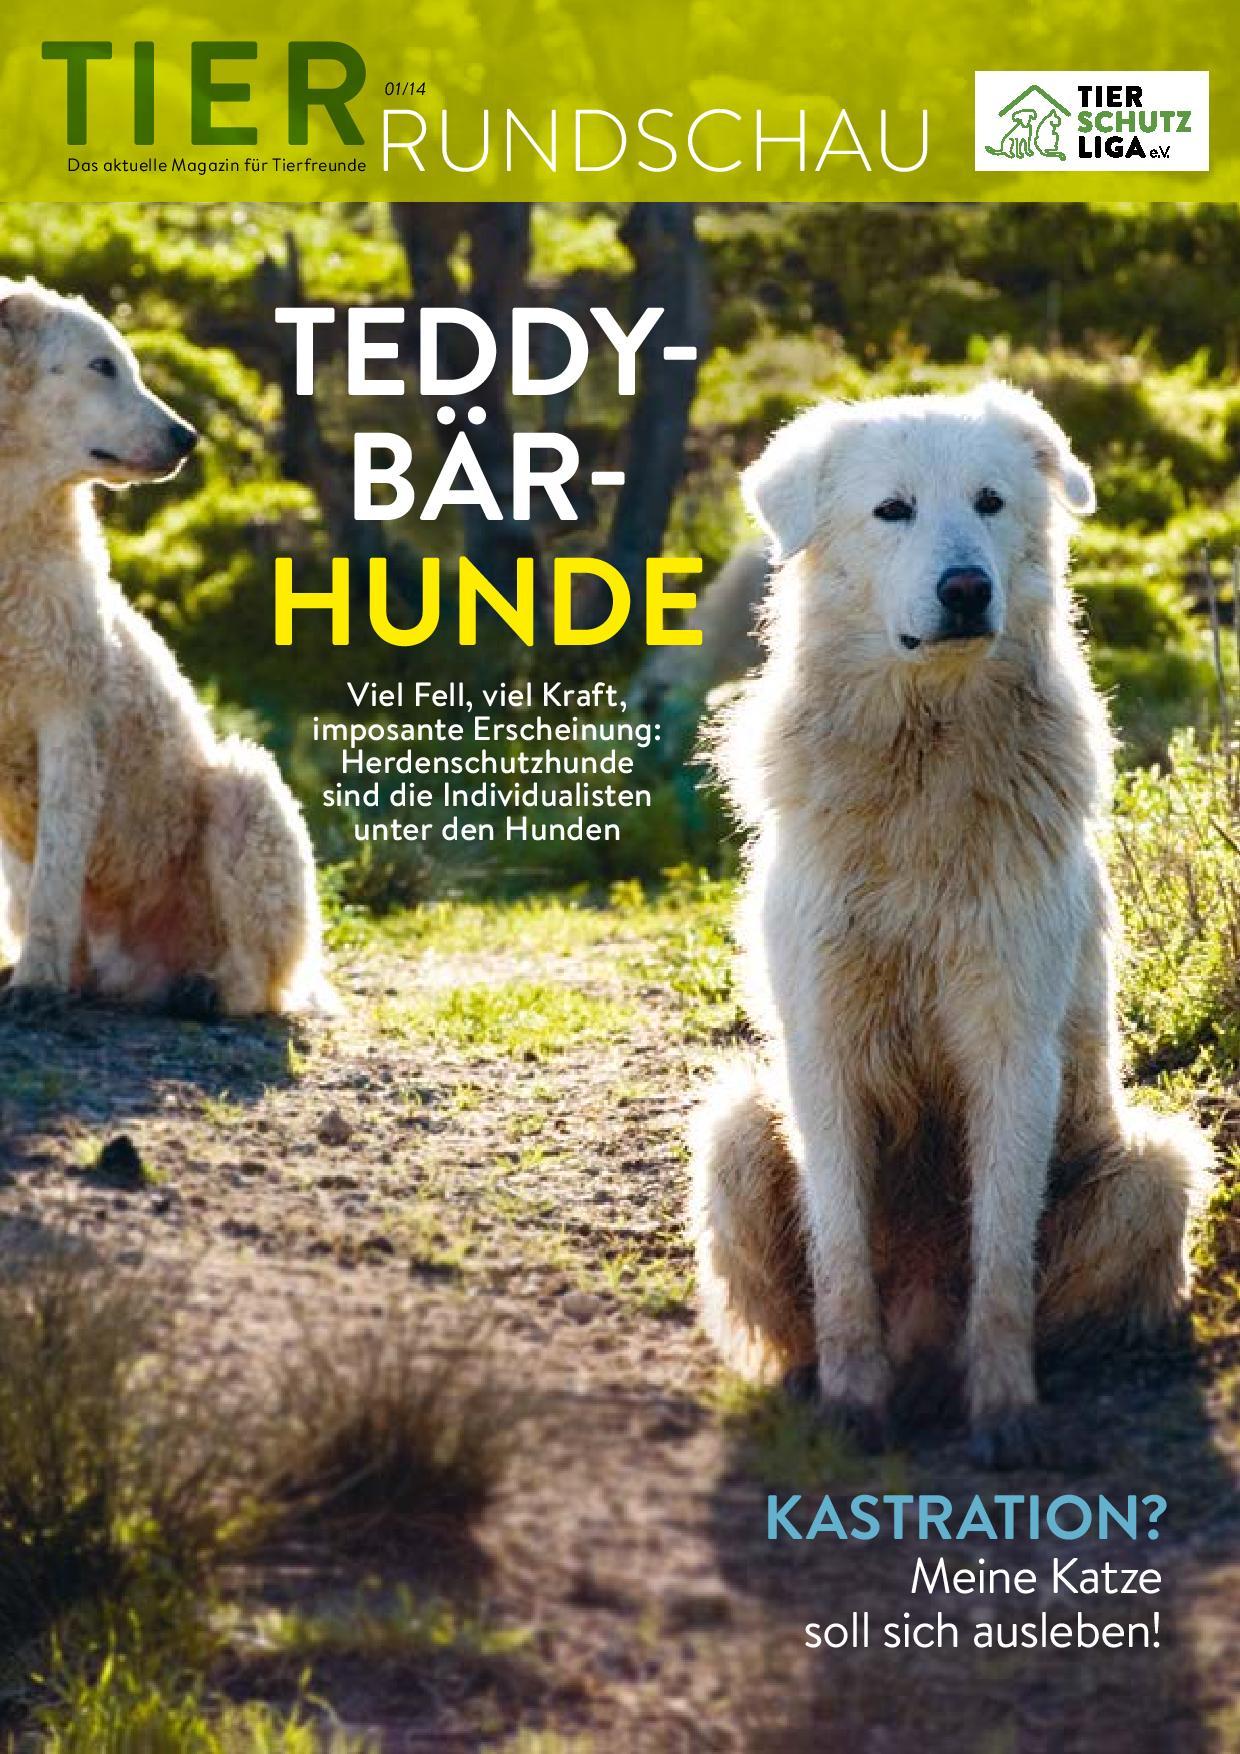 Tierrundschau-page-001 Tierrundschau - aktuelles Tiermagazin